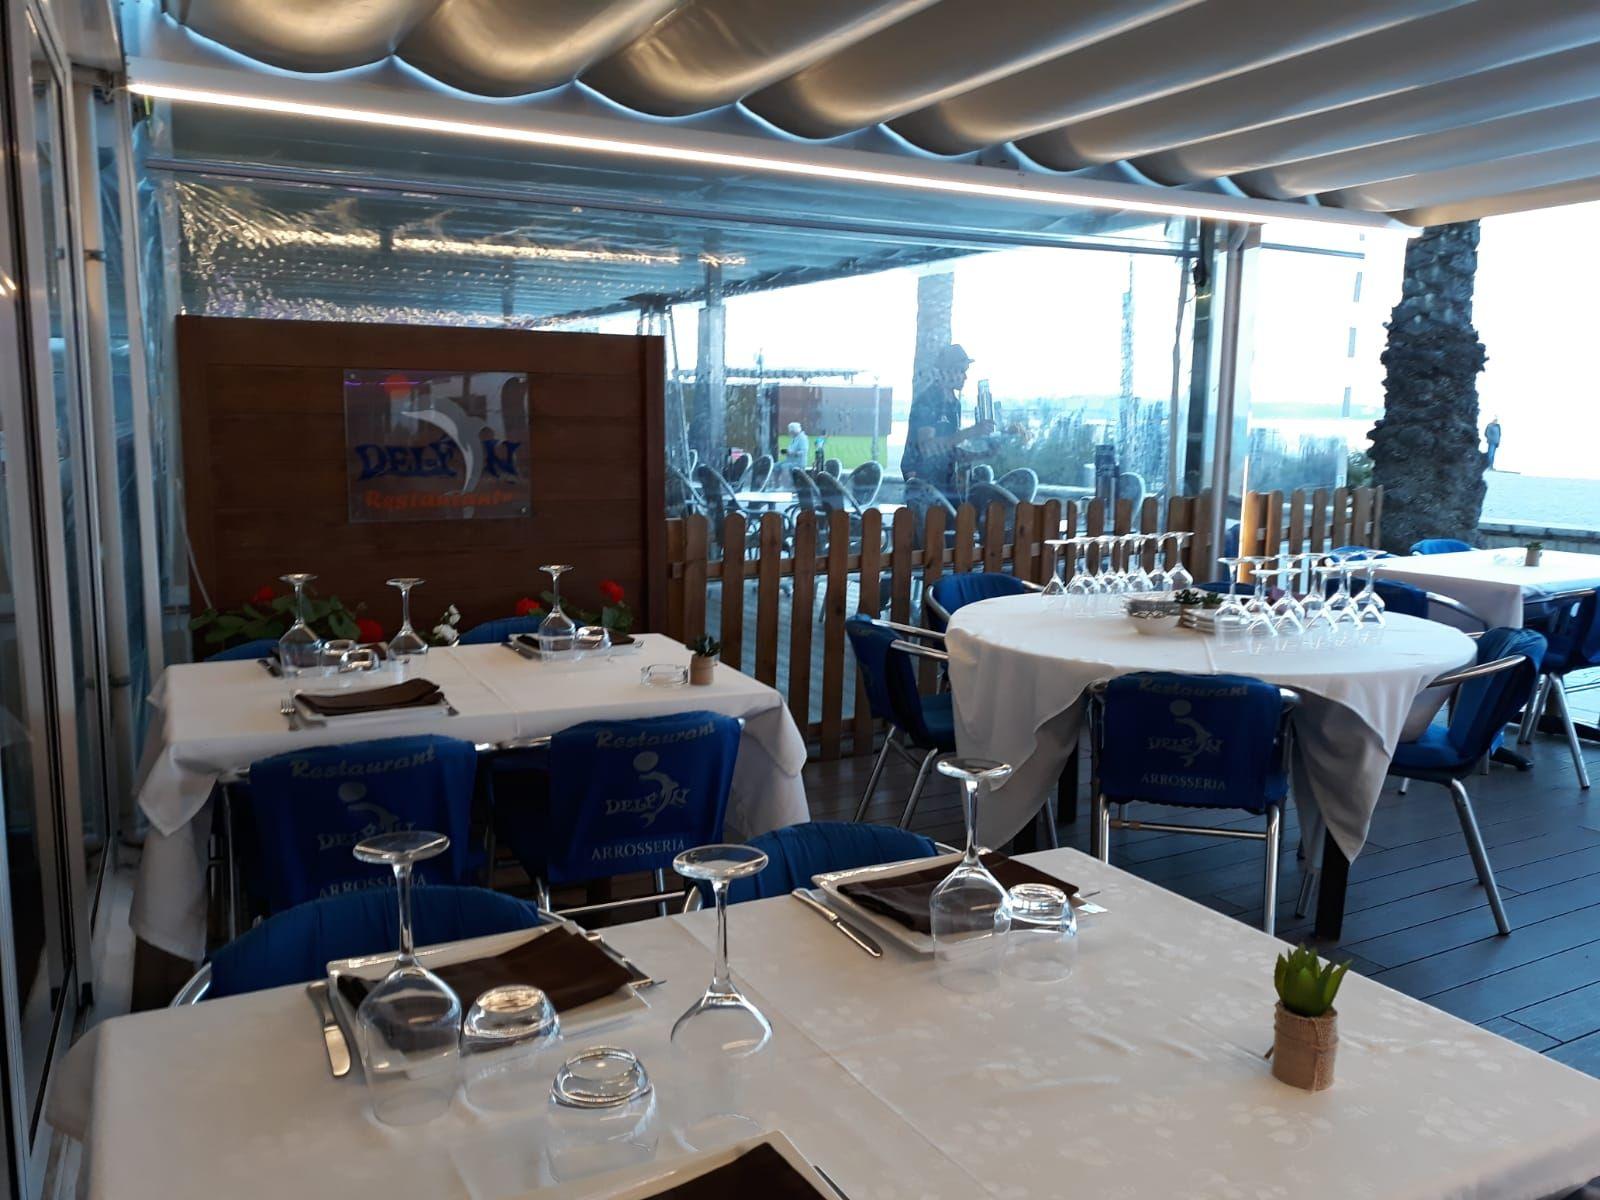 Restaurante de cocina marinera en Salou